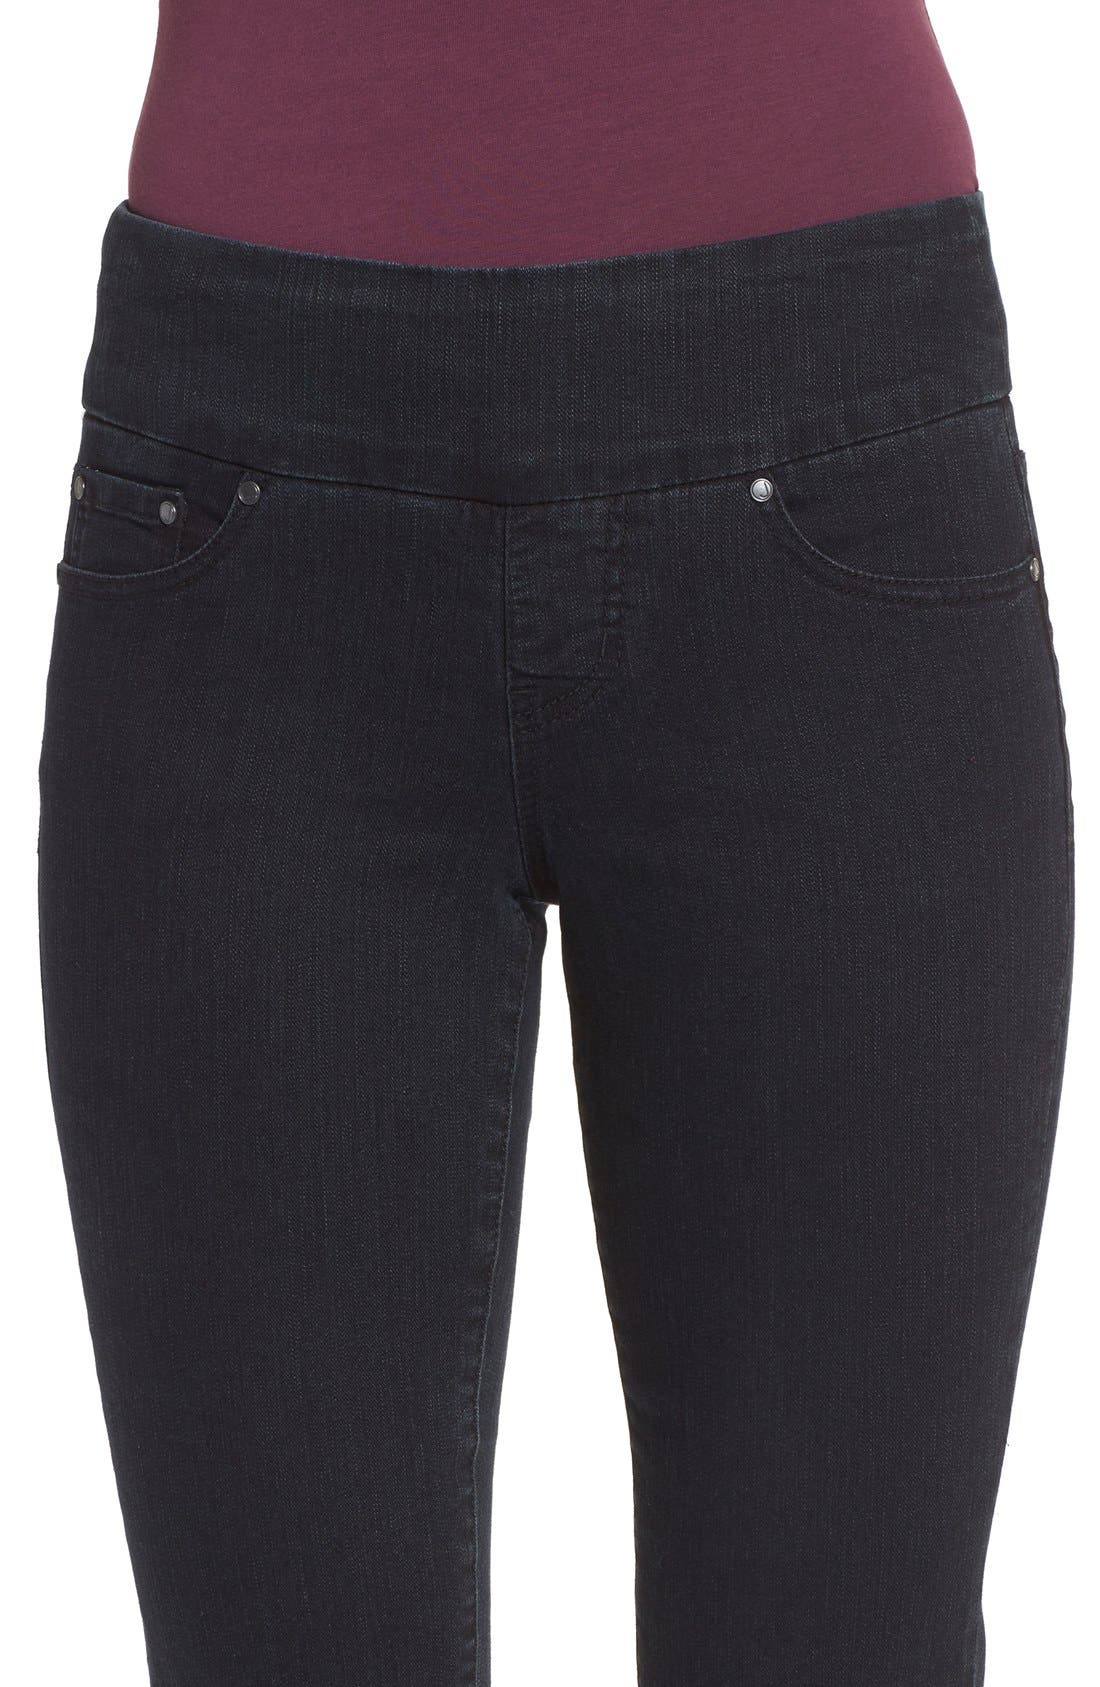 Alternate Image 4  - Jag Jeans 'Peri' Straight Leg Pull-On Jeans (Black Void) (Regular & Petite) (Online Only)